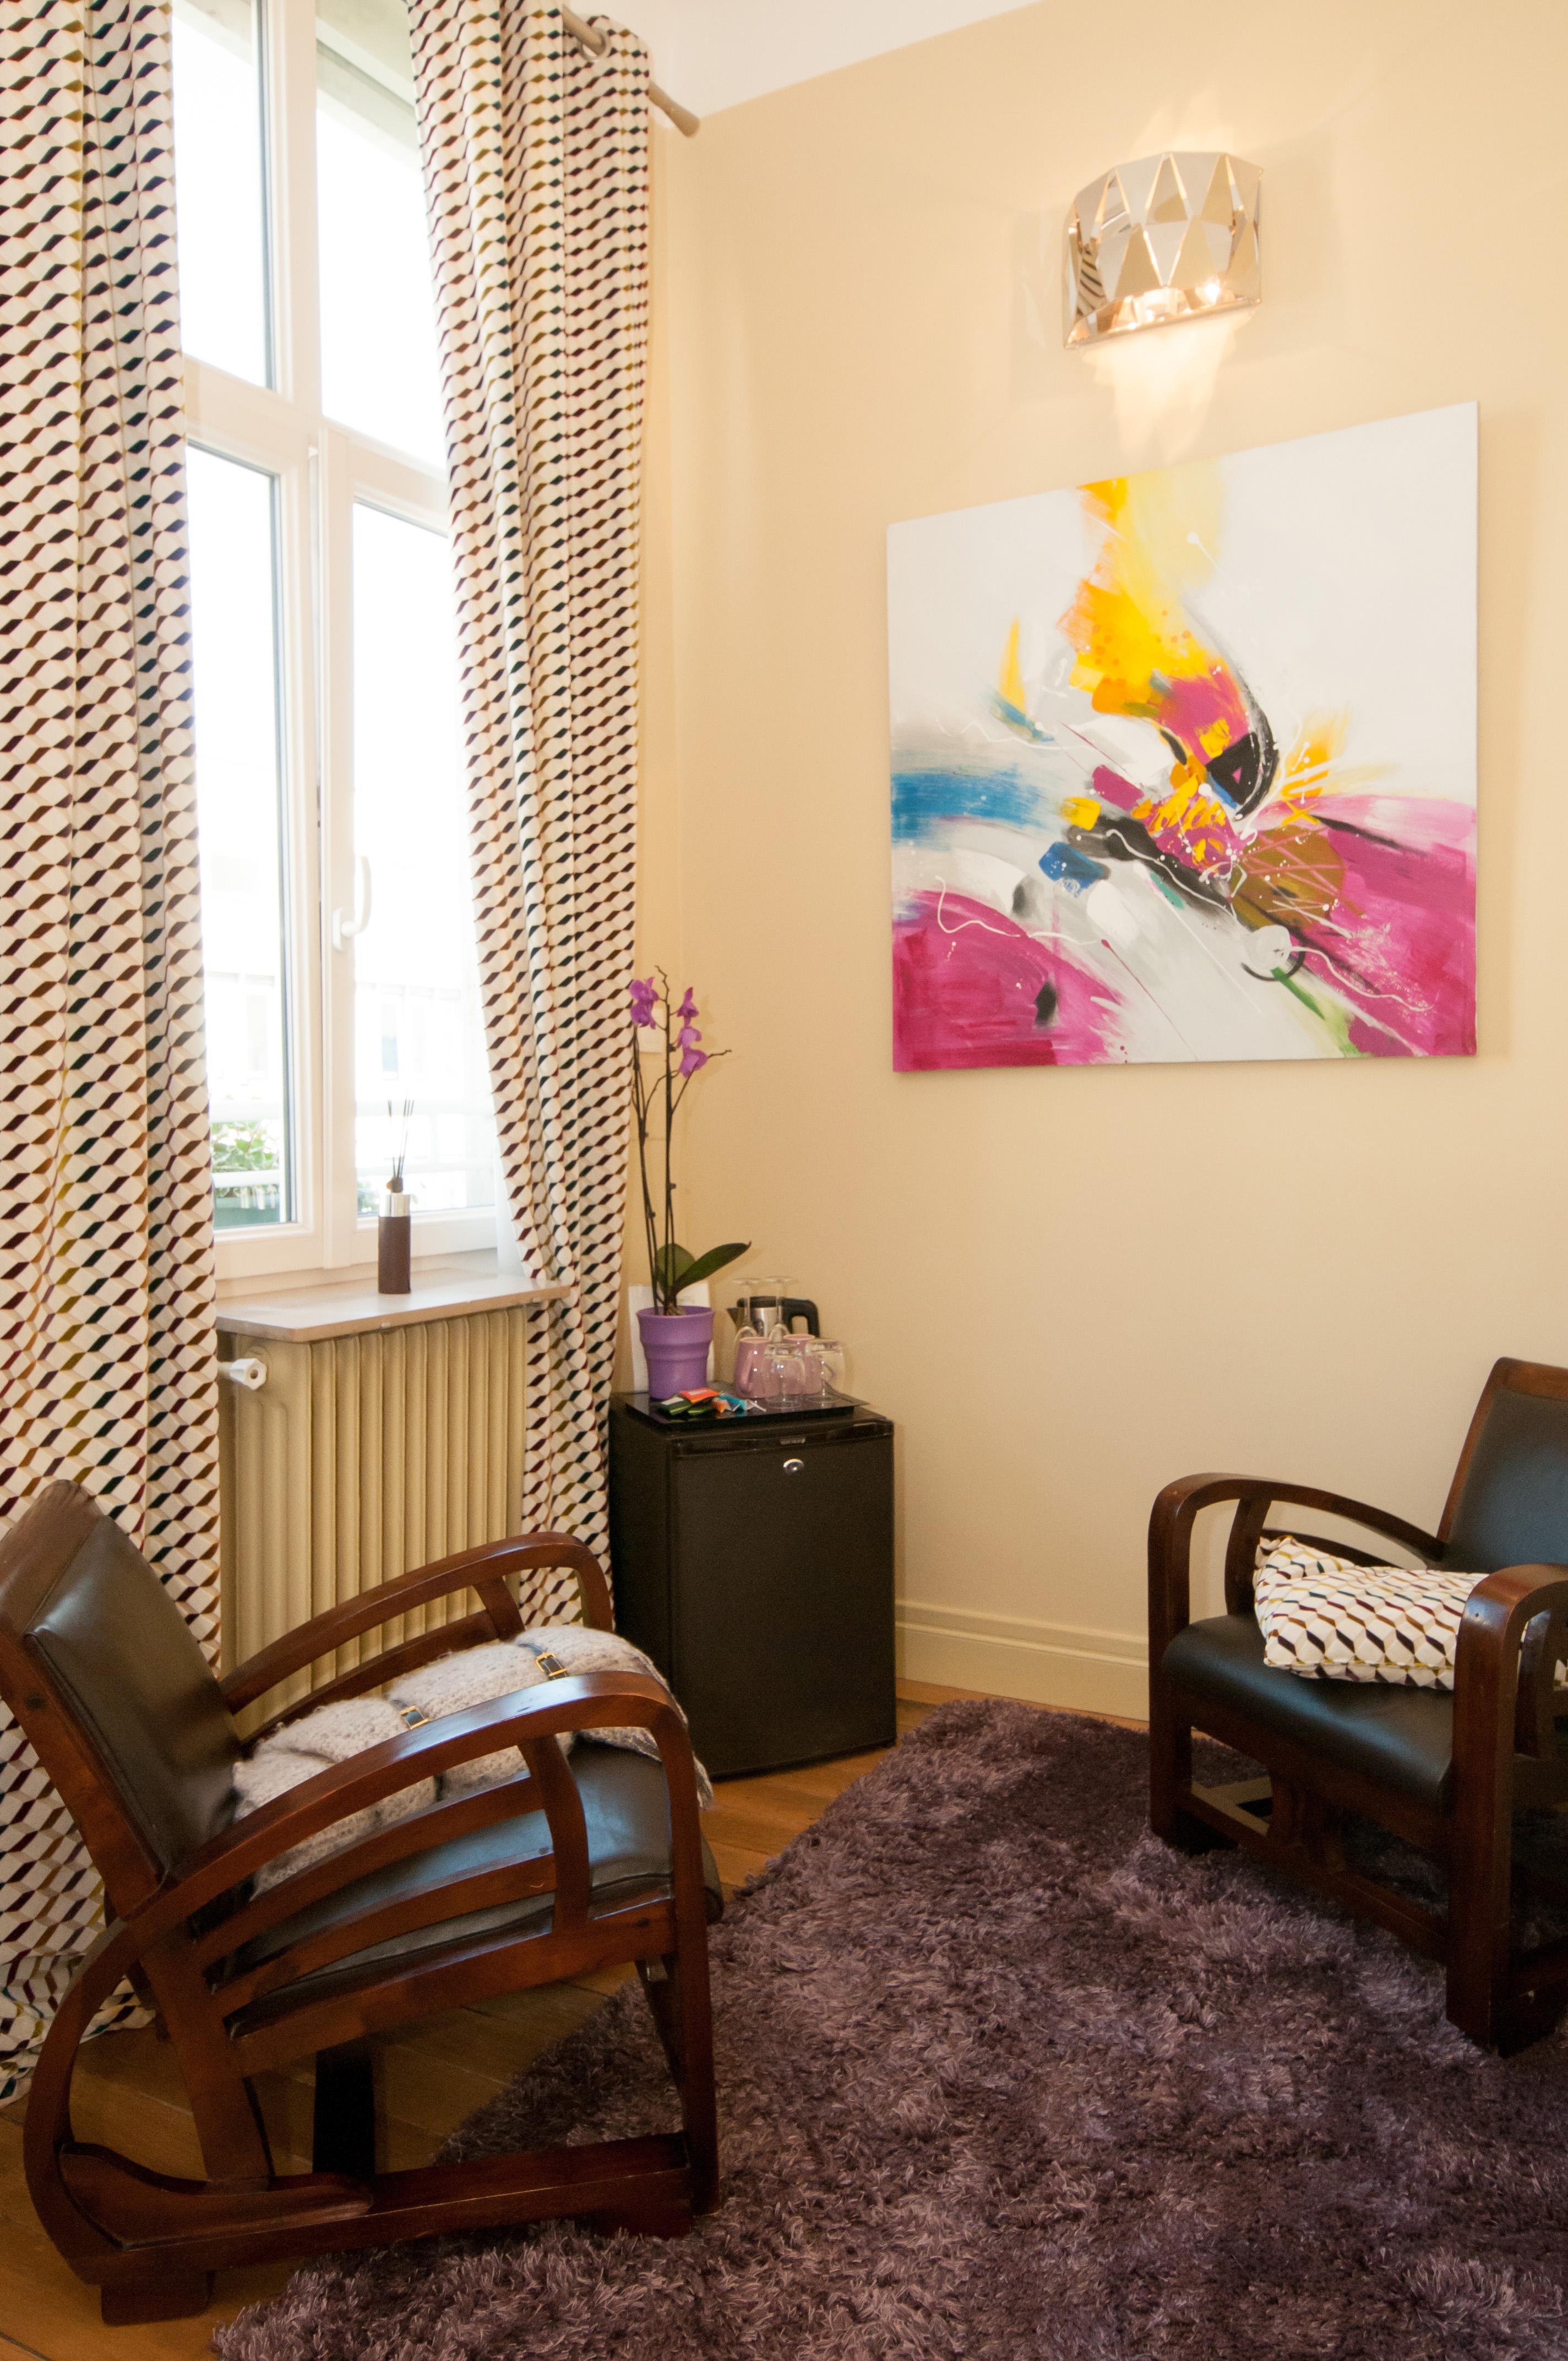 maison d hotes reims ventana blog. Black Bedroom Furniture Sets. Home Design Ideas